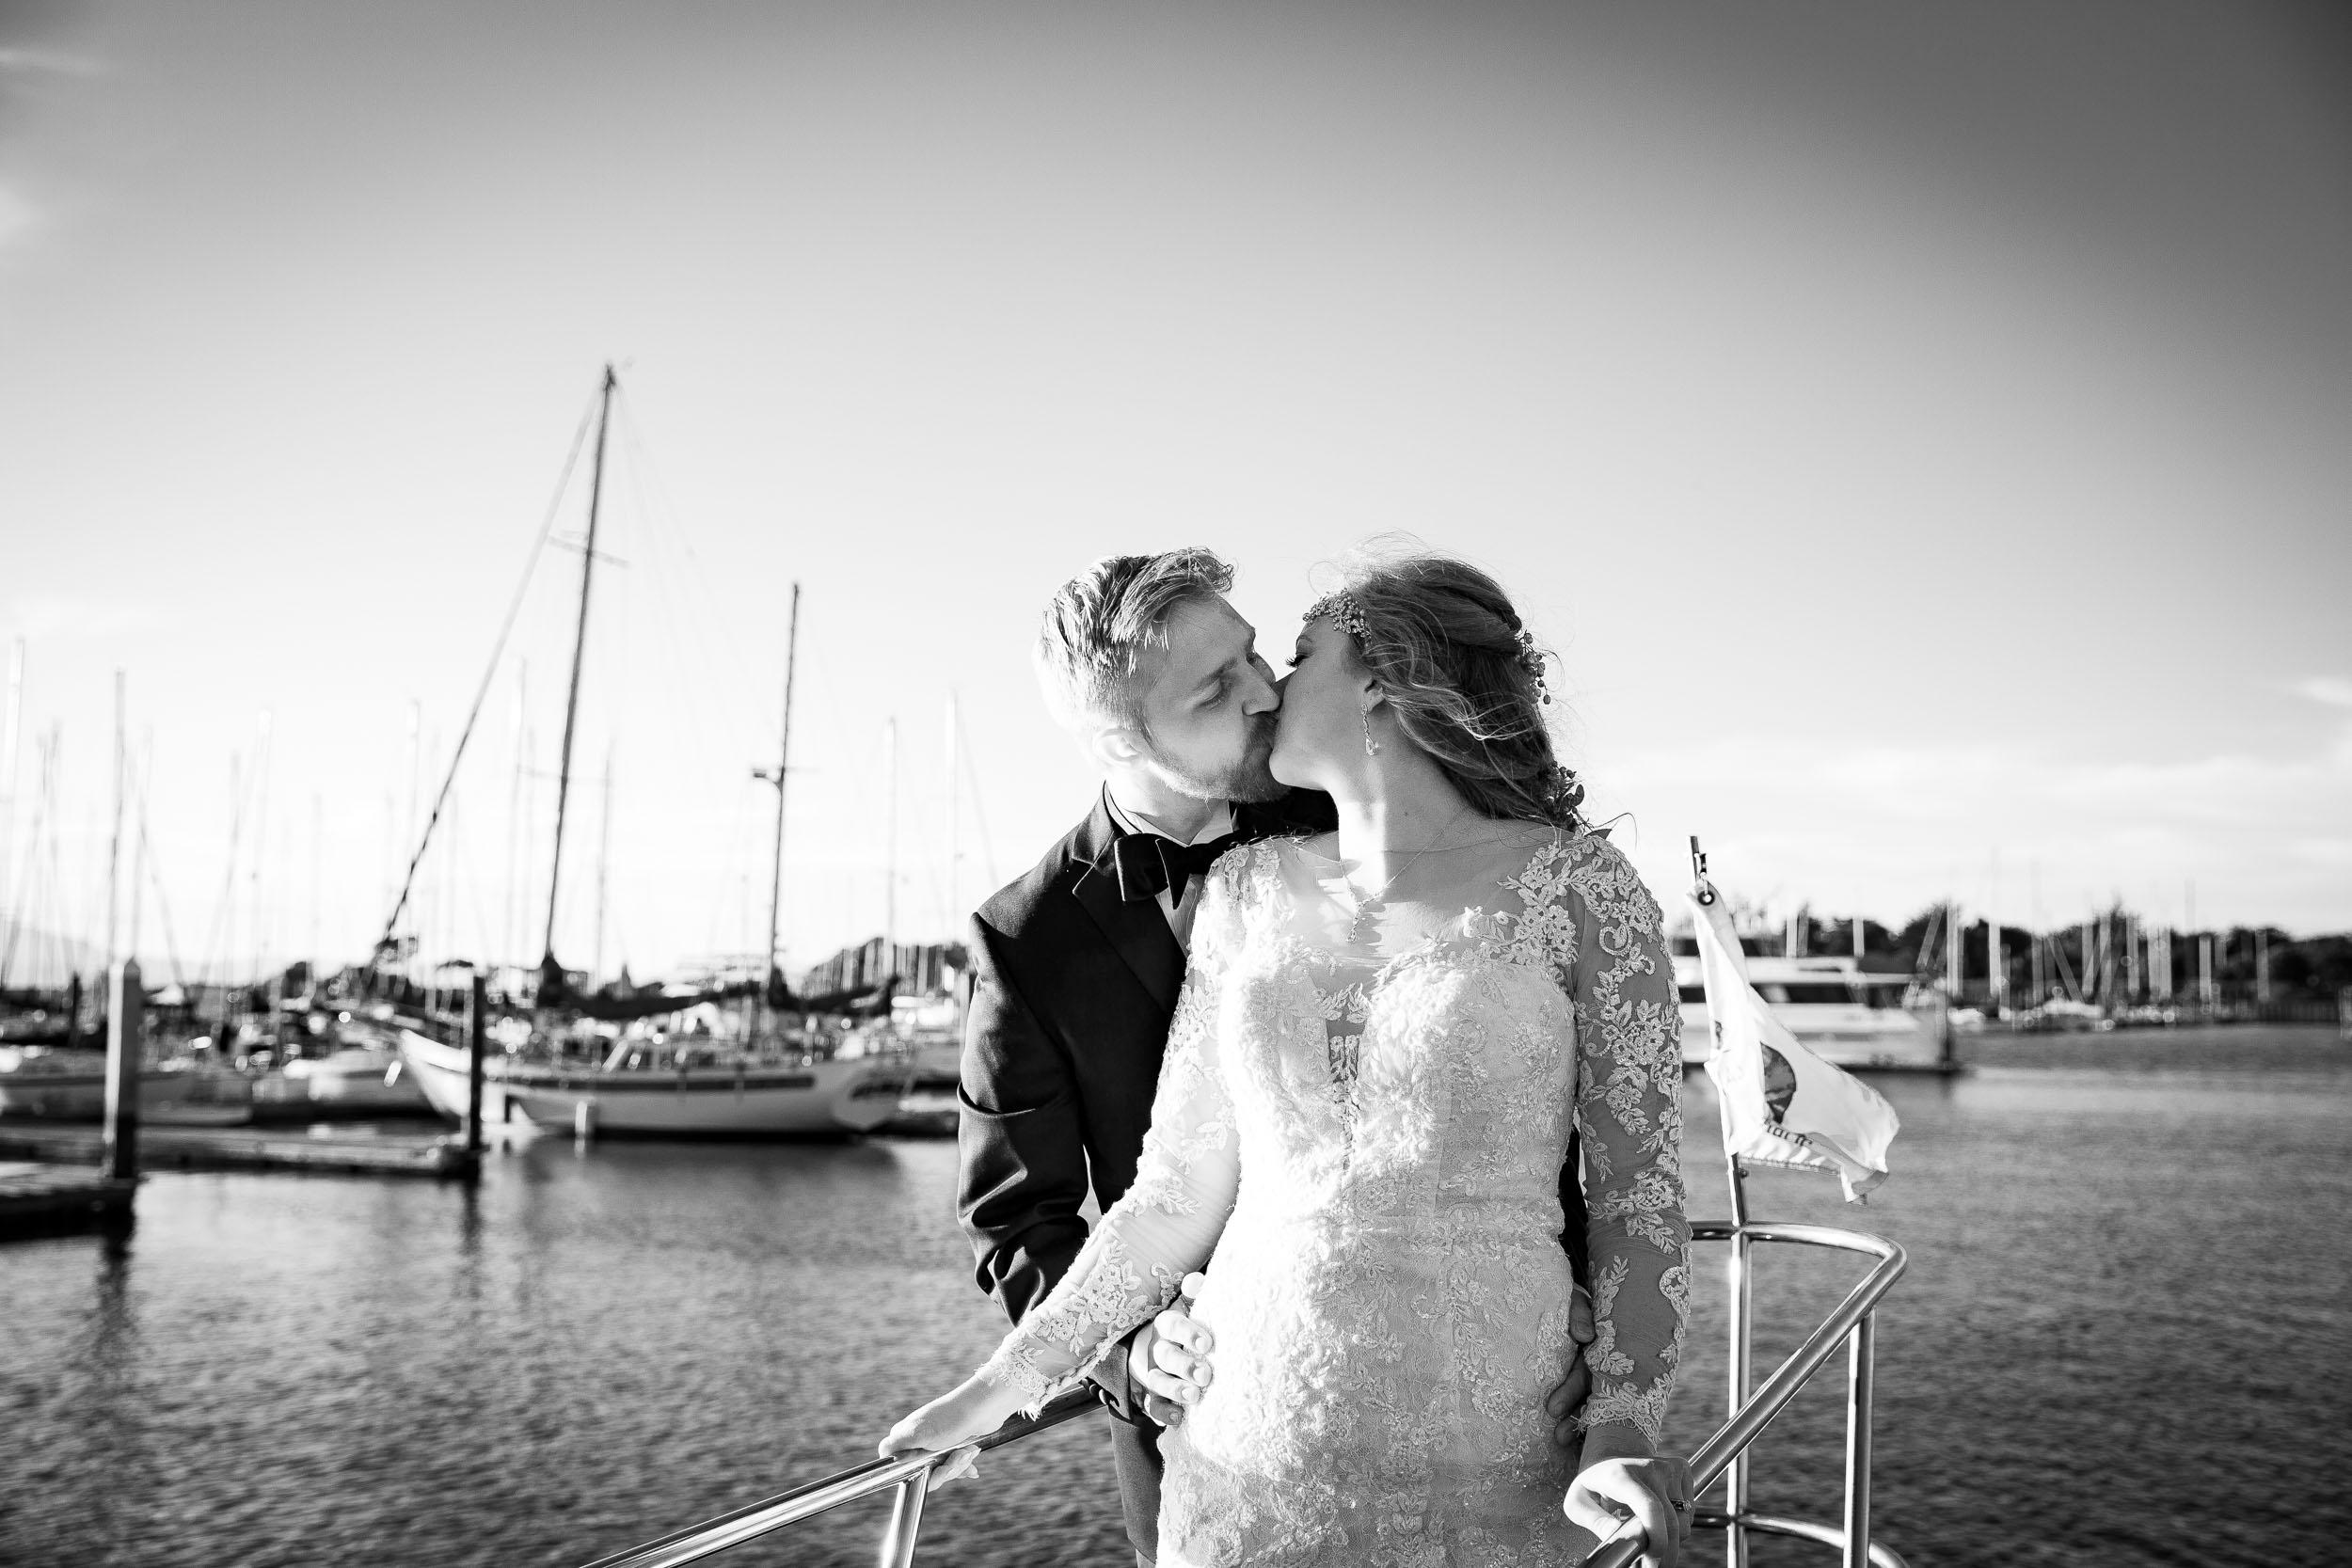 Berkeley Botanical Garden Wedding Ceremony in the Redwood Grove Ceremony and SF Bay Wedding Cruise Reception-71.jpg